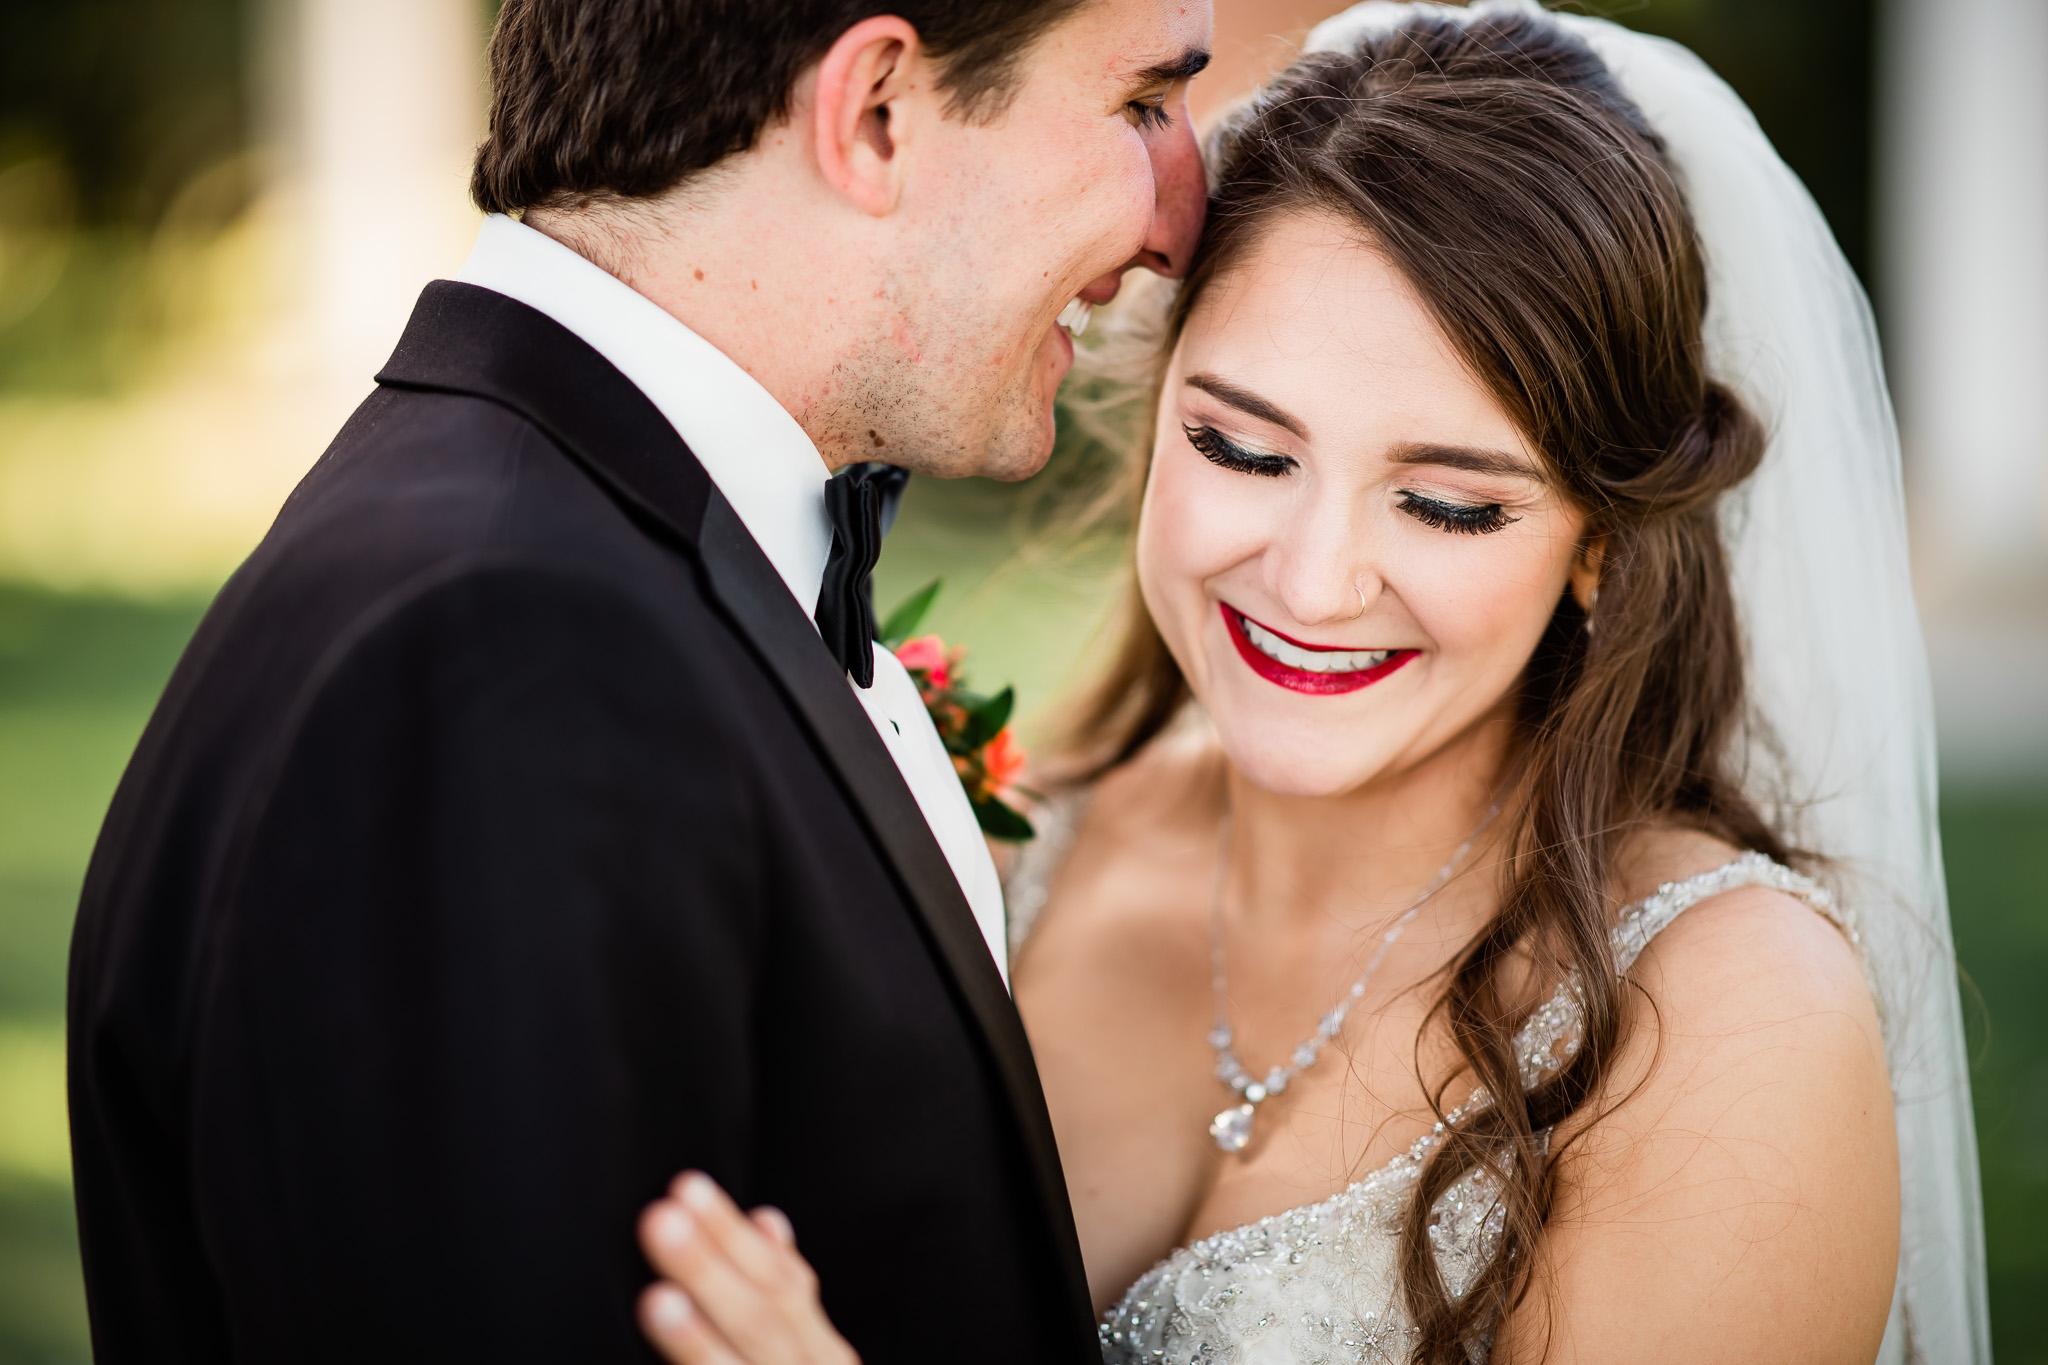 TAMPA_WEDDING_PHOTOGRAPHER_MPMZ_D82_2622_0072.jpg